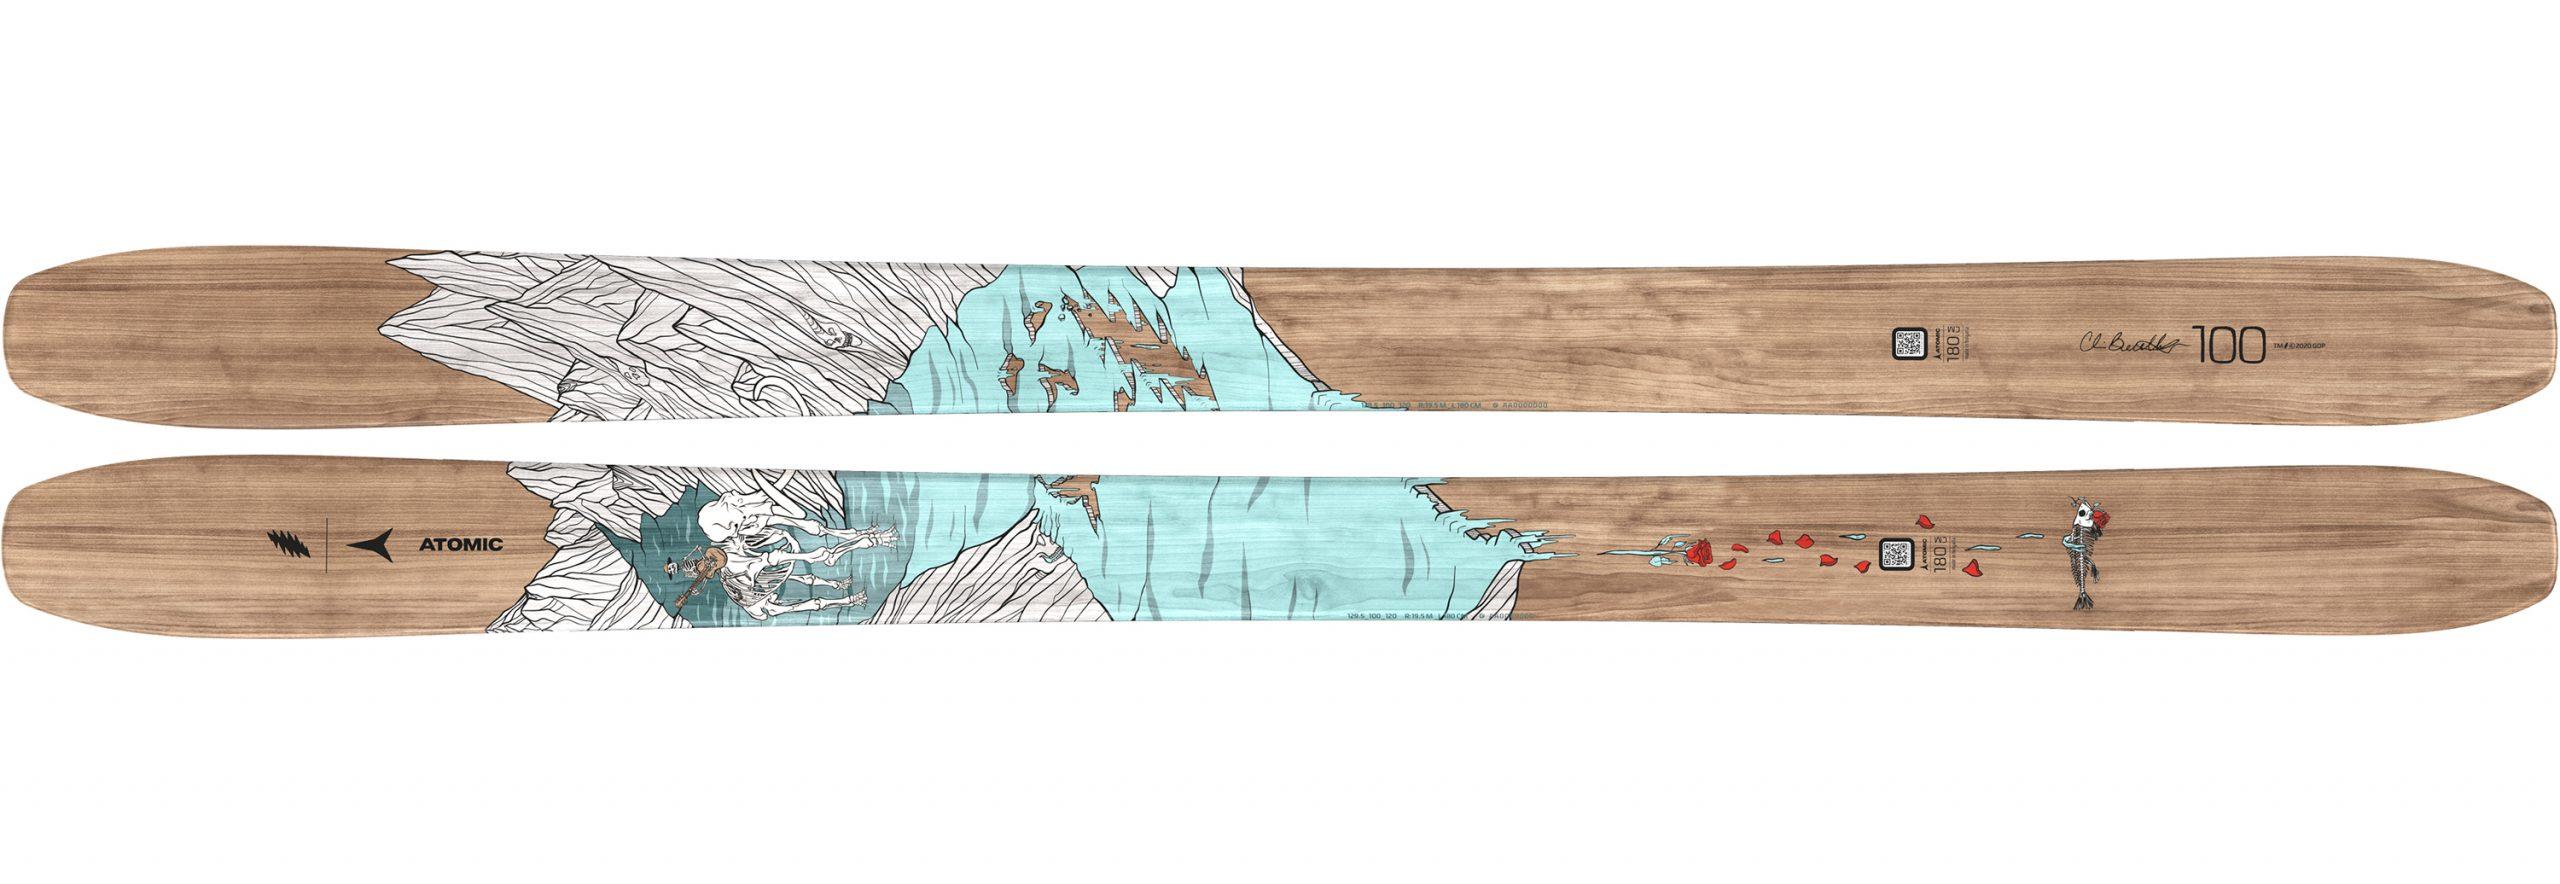 Ski Atomic Bent Chetler 100